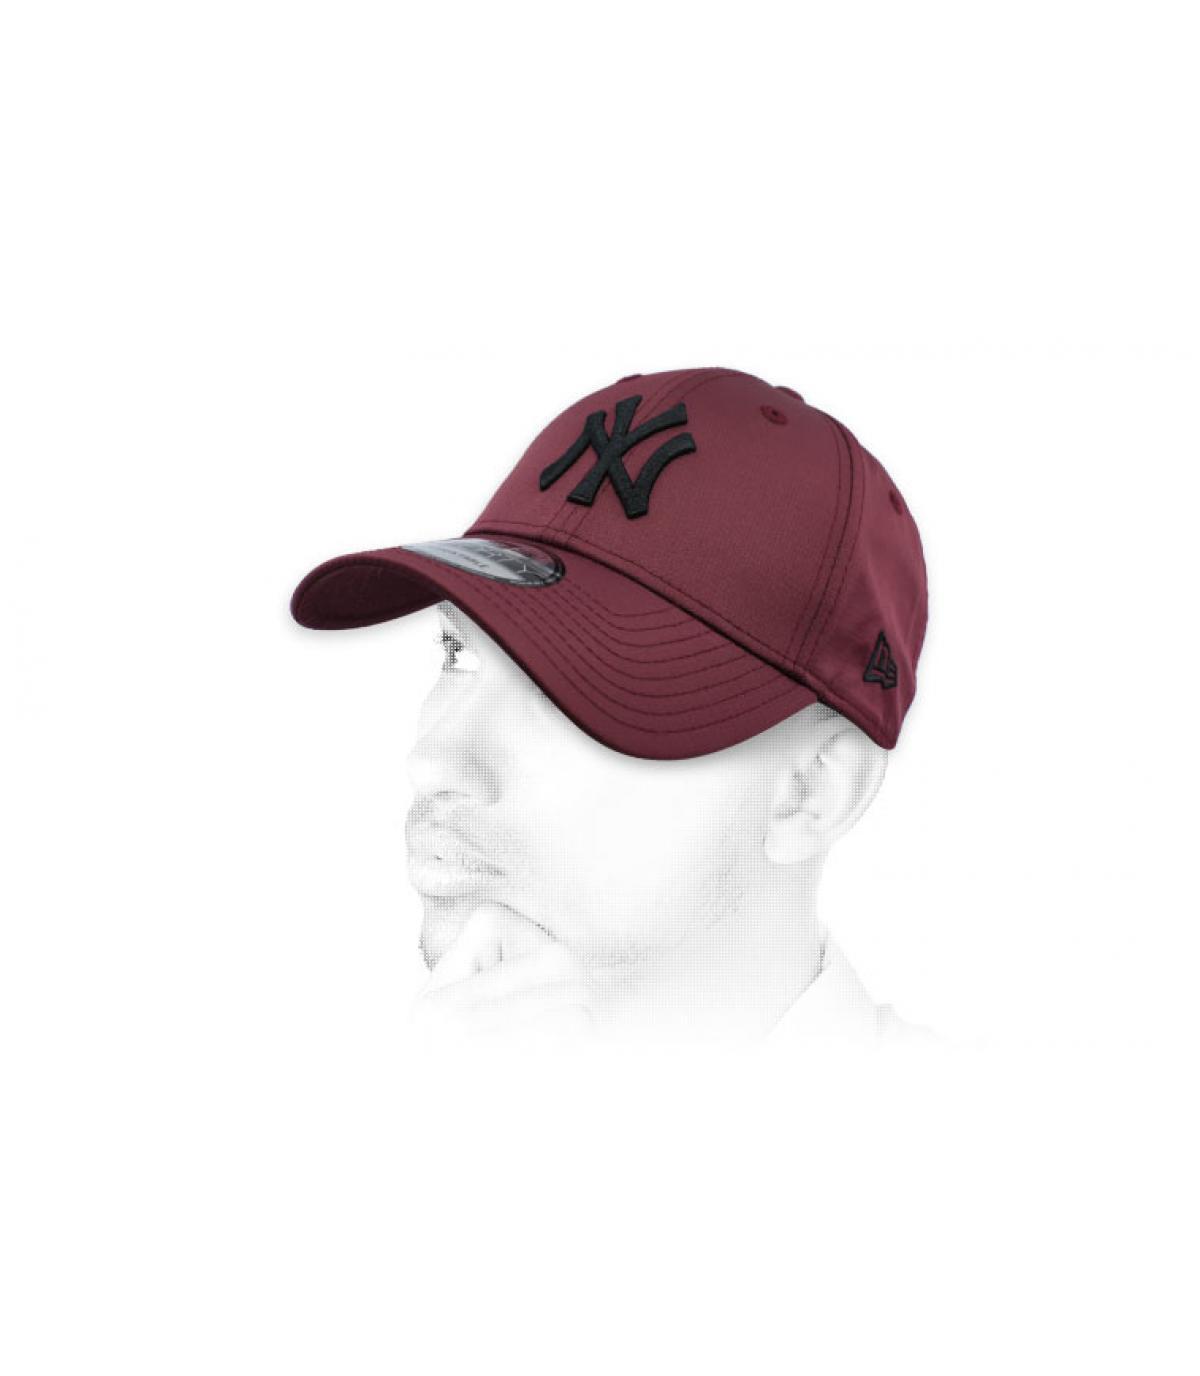 zwarte bordeaux NY cap